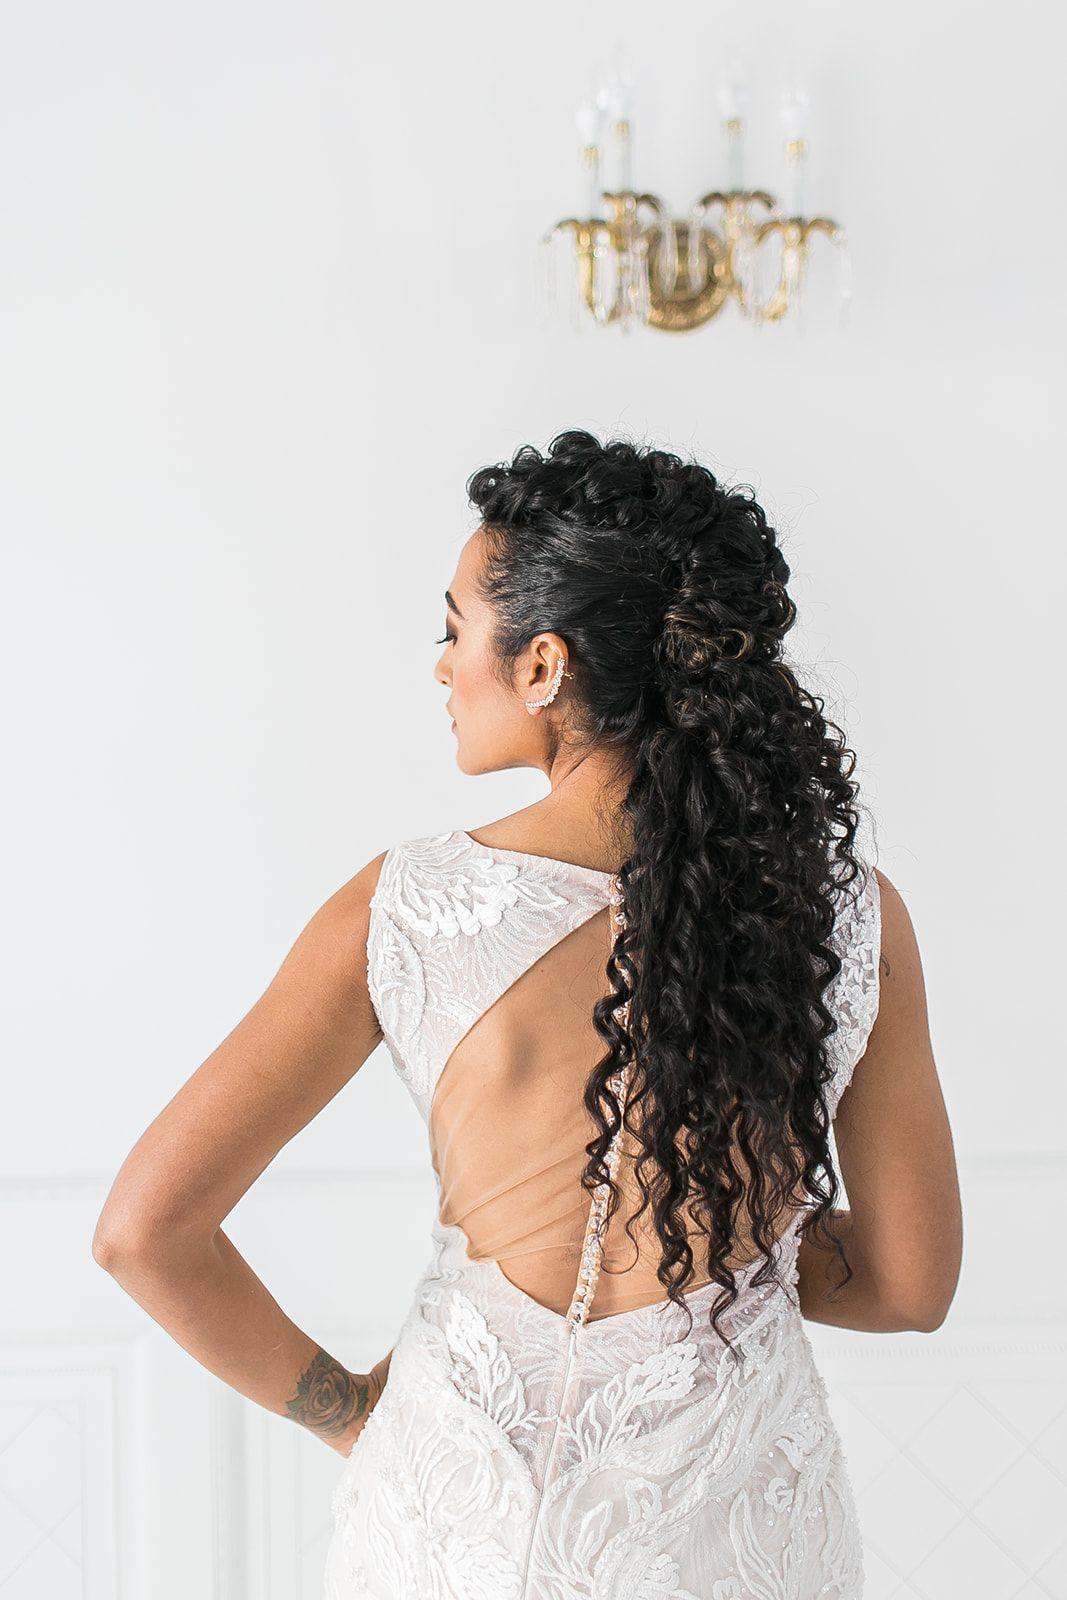 Half fauxhawk, half cascading curls, totally stunning